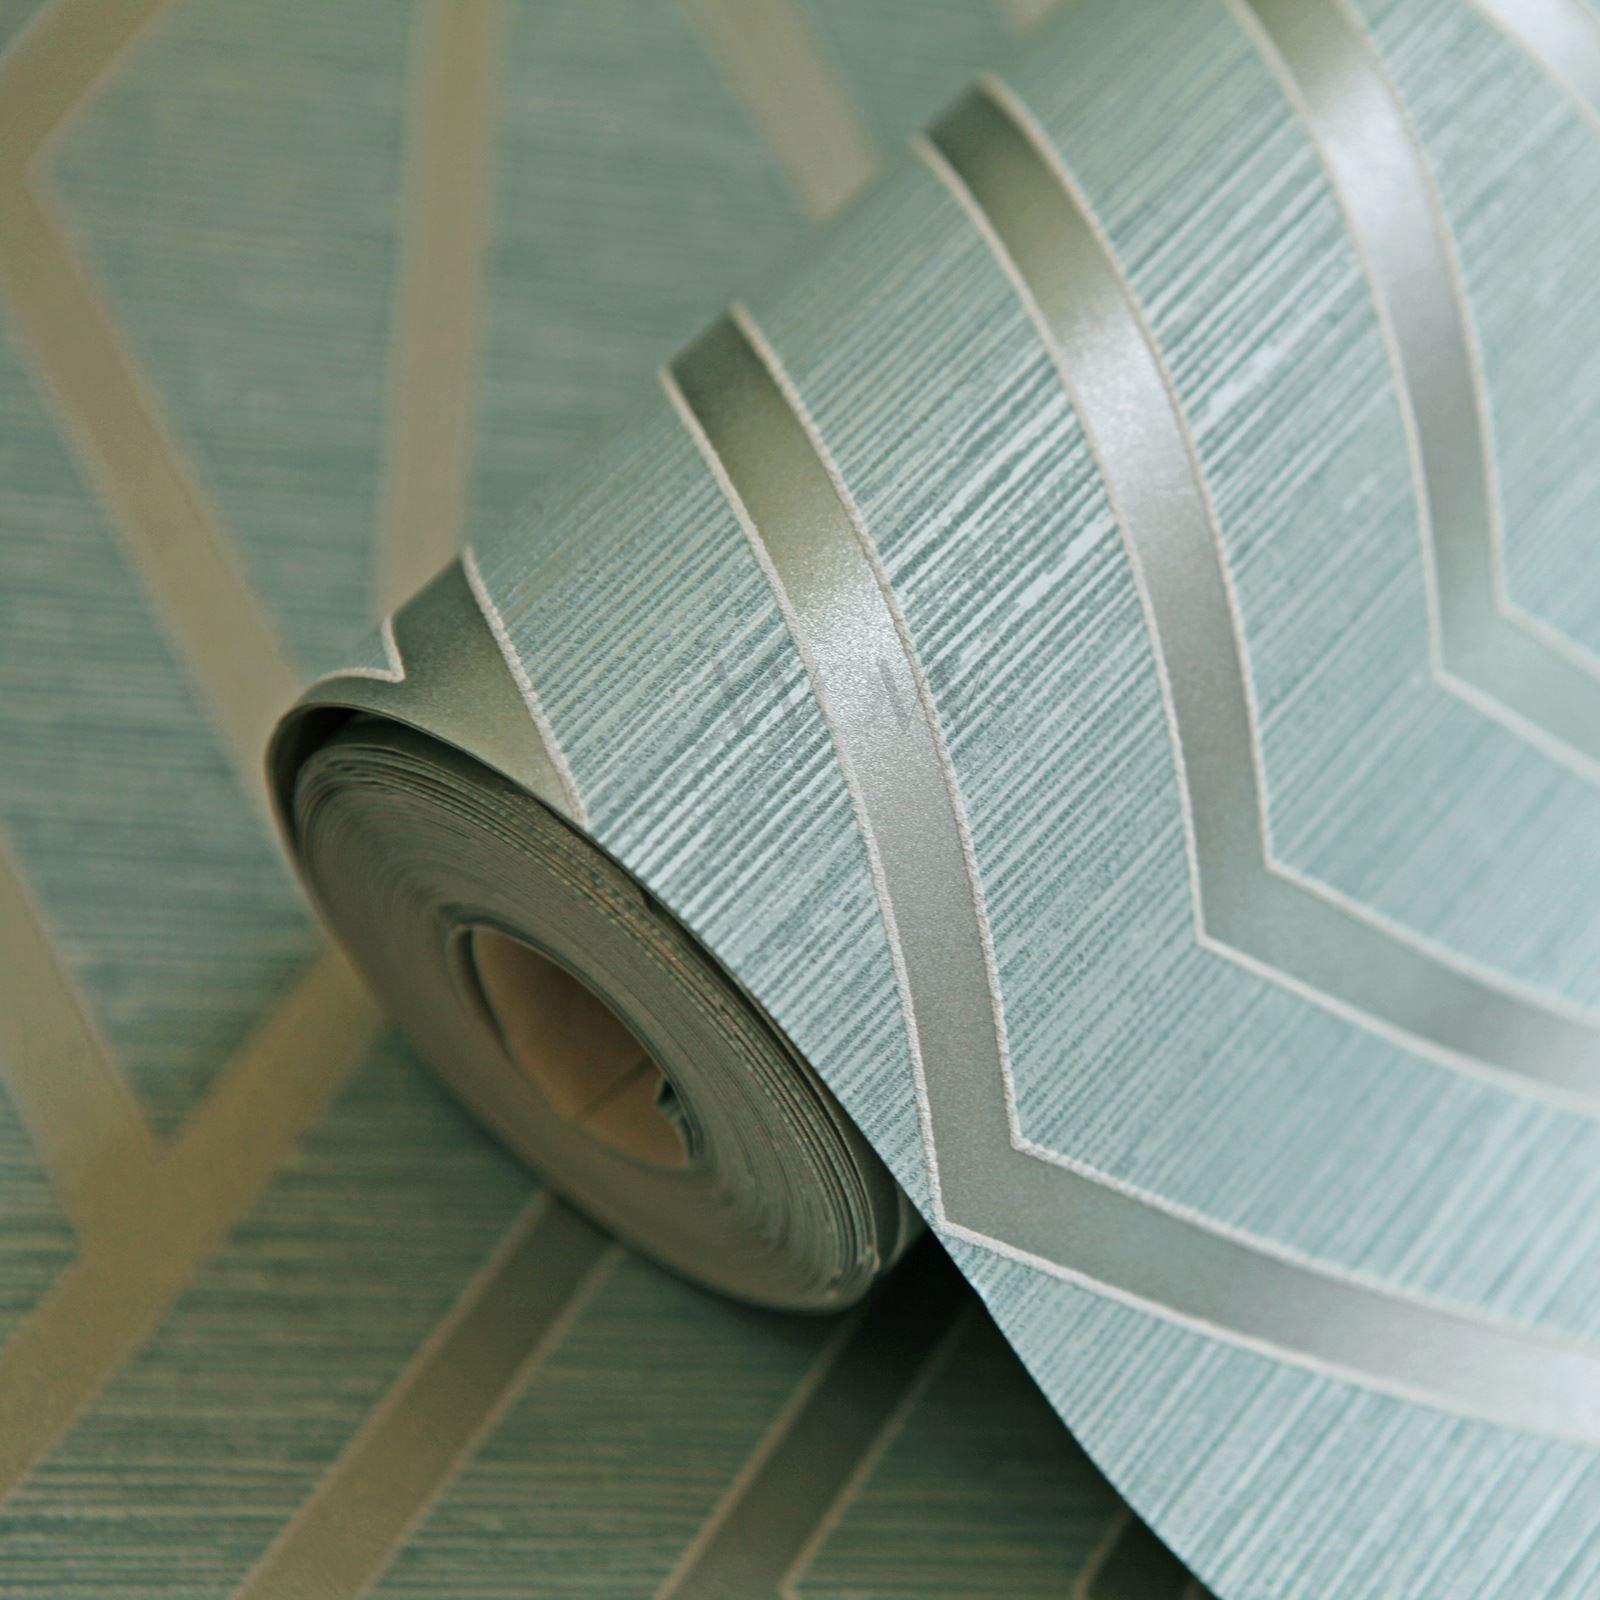 miniatura 51 - Carta da Parati Geometrica Arredamento Camera Moderno Vari Disegni e Colori